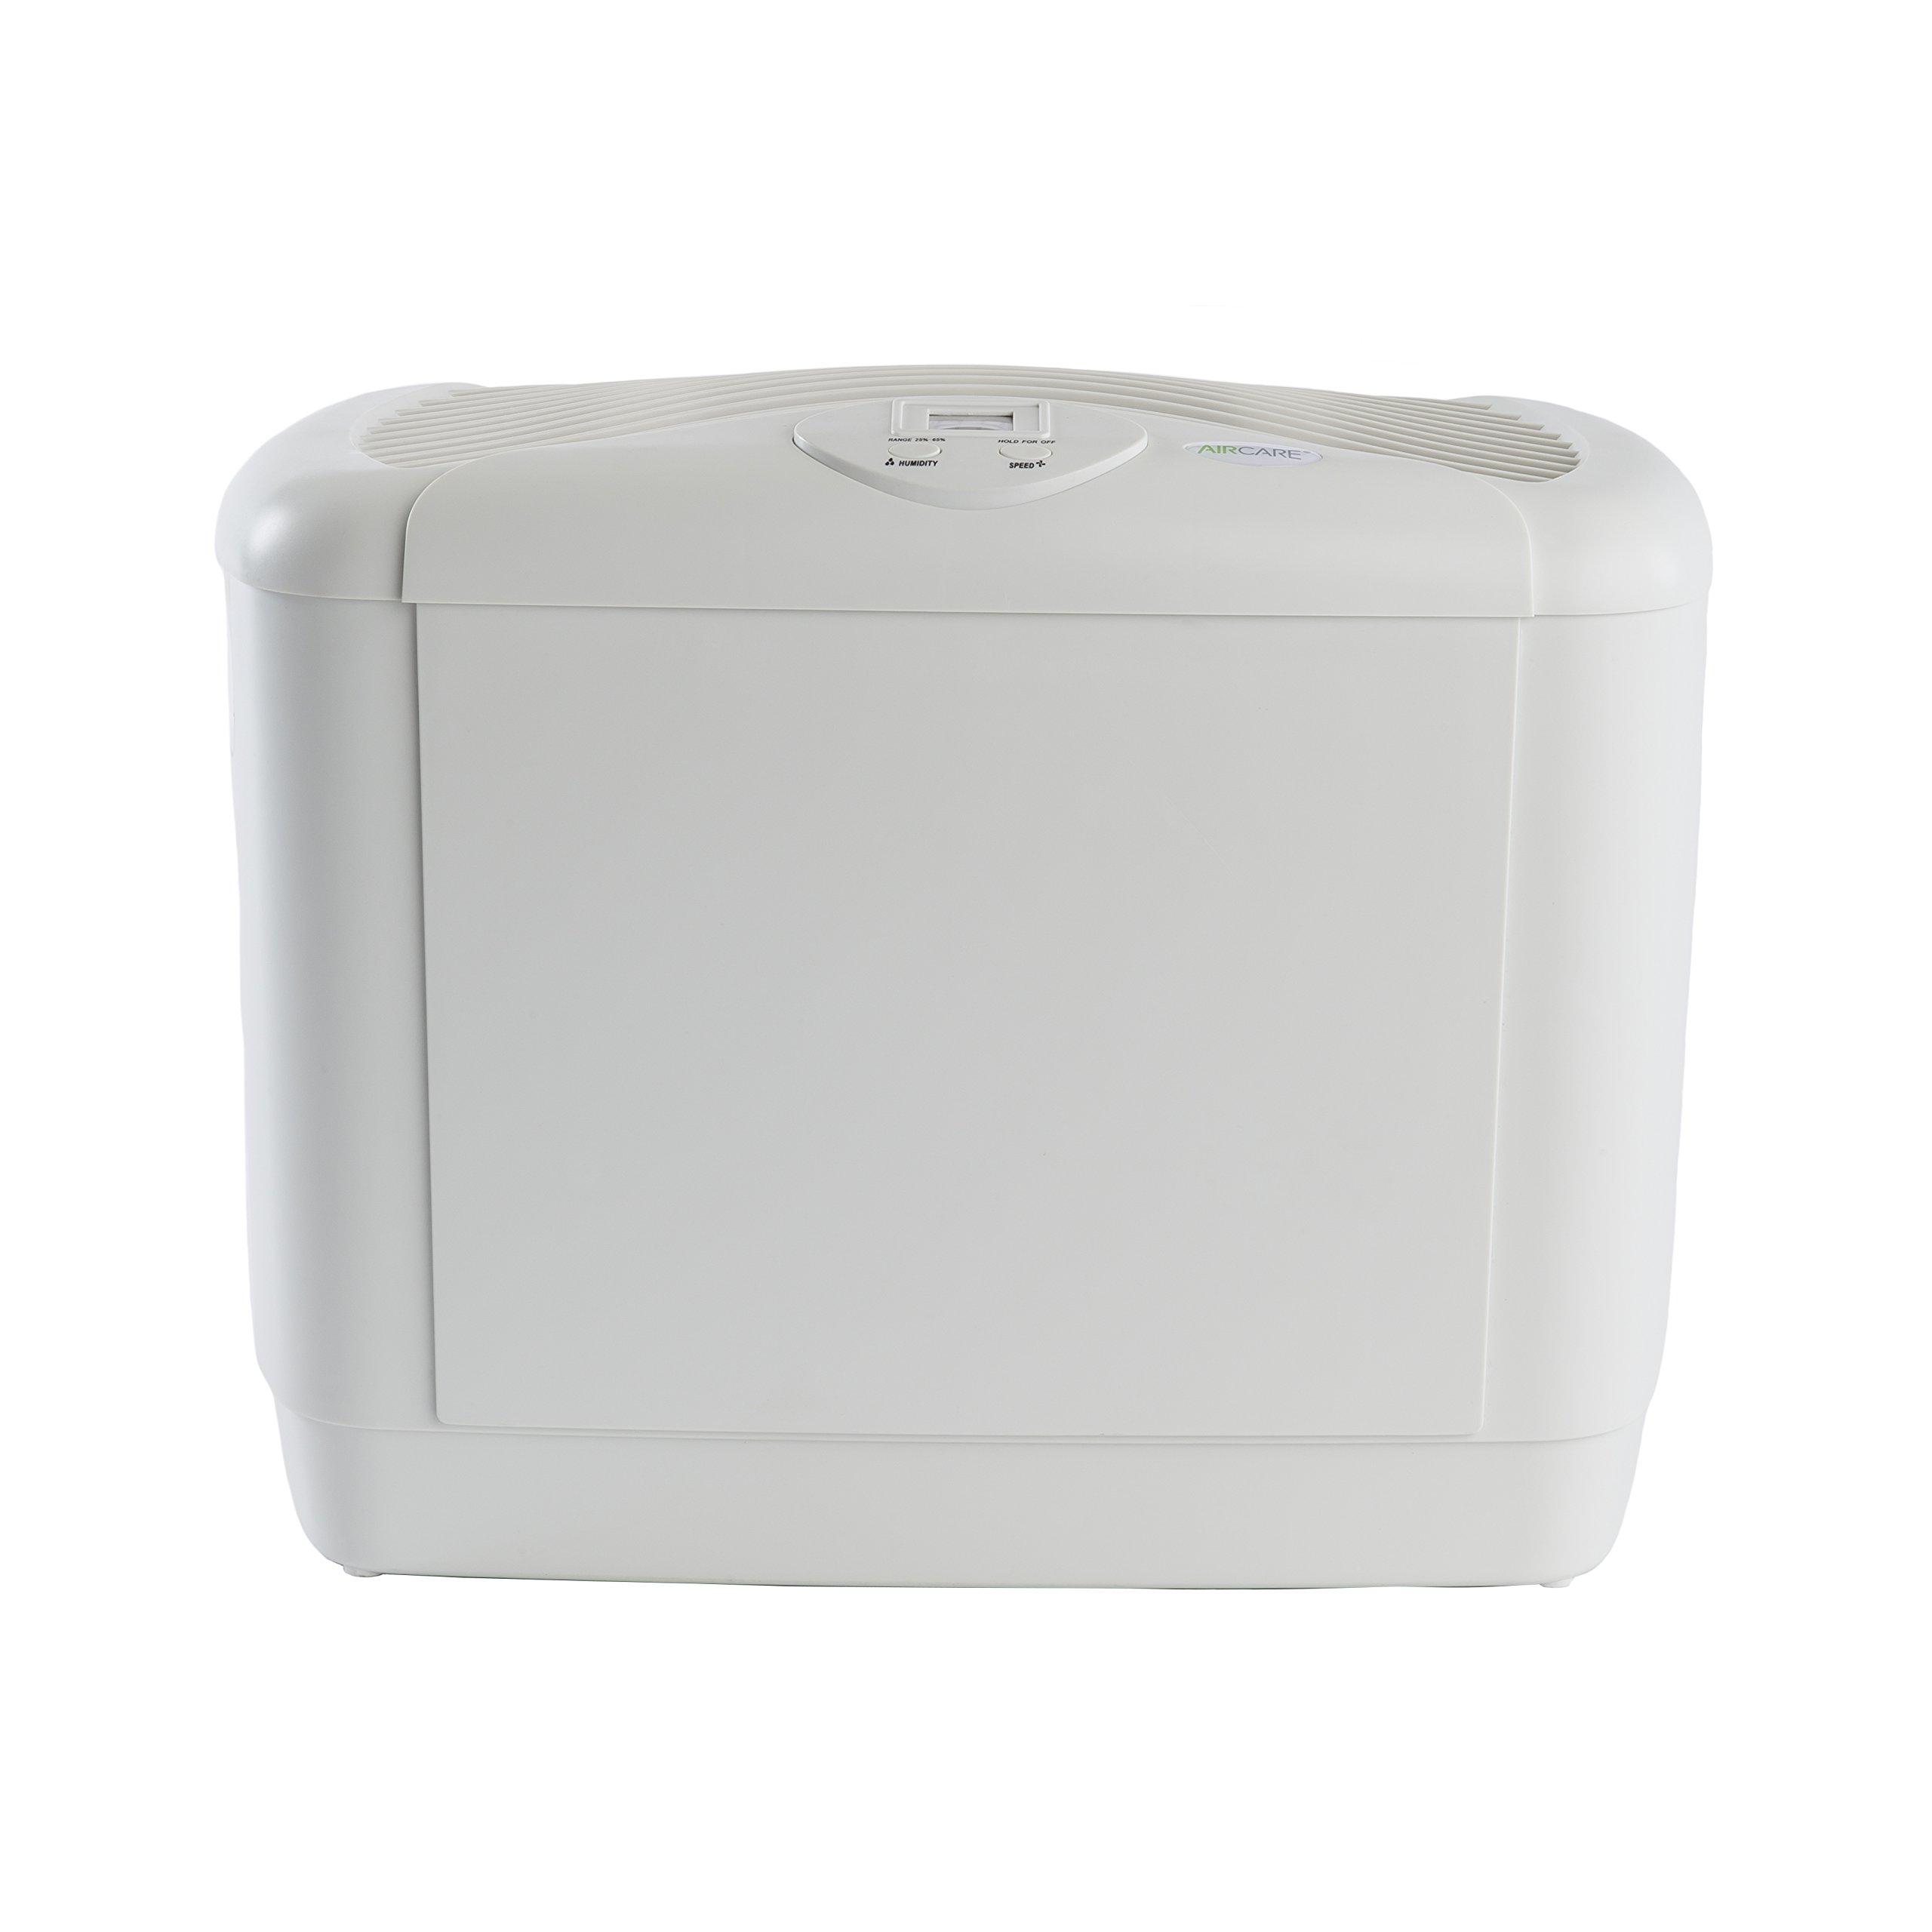 Essick Air 5D6 700 4-Speed Mini Console Humidifier,White